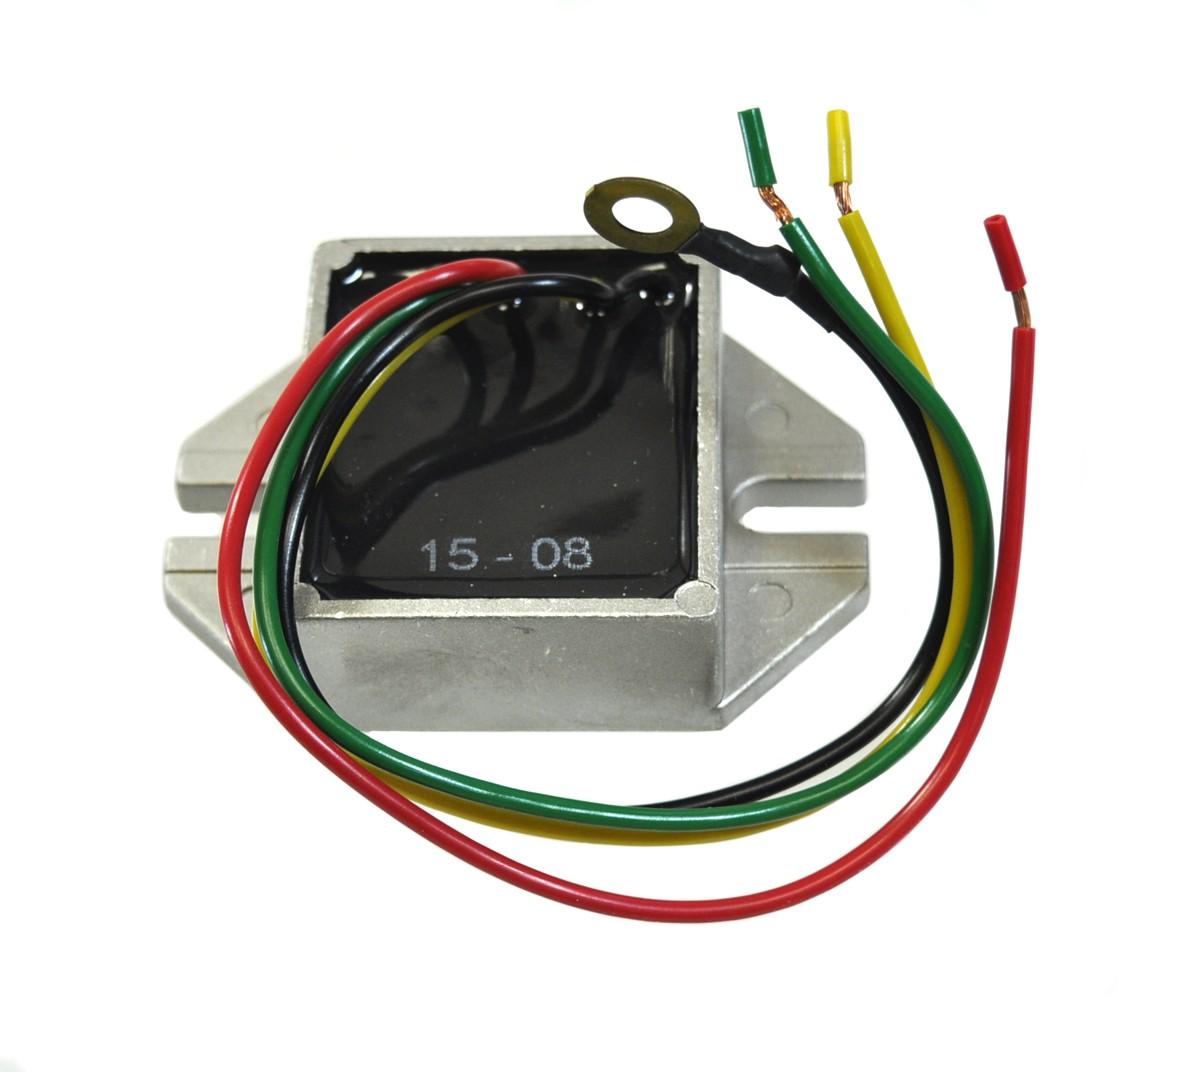 81 618 ?resize\=665%2C594\&ssl\=1 99 ski doo mach z 800 wiring diagram wiring diagrams Ski-Doo Rev Wire Diagram at bayanpartner.co